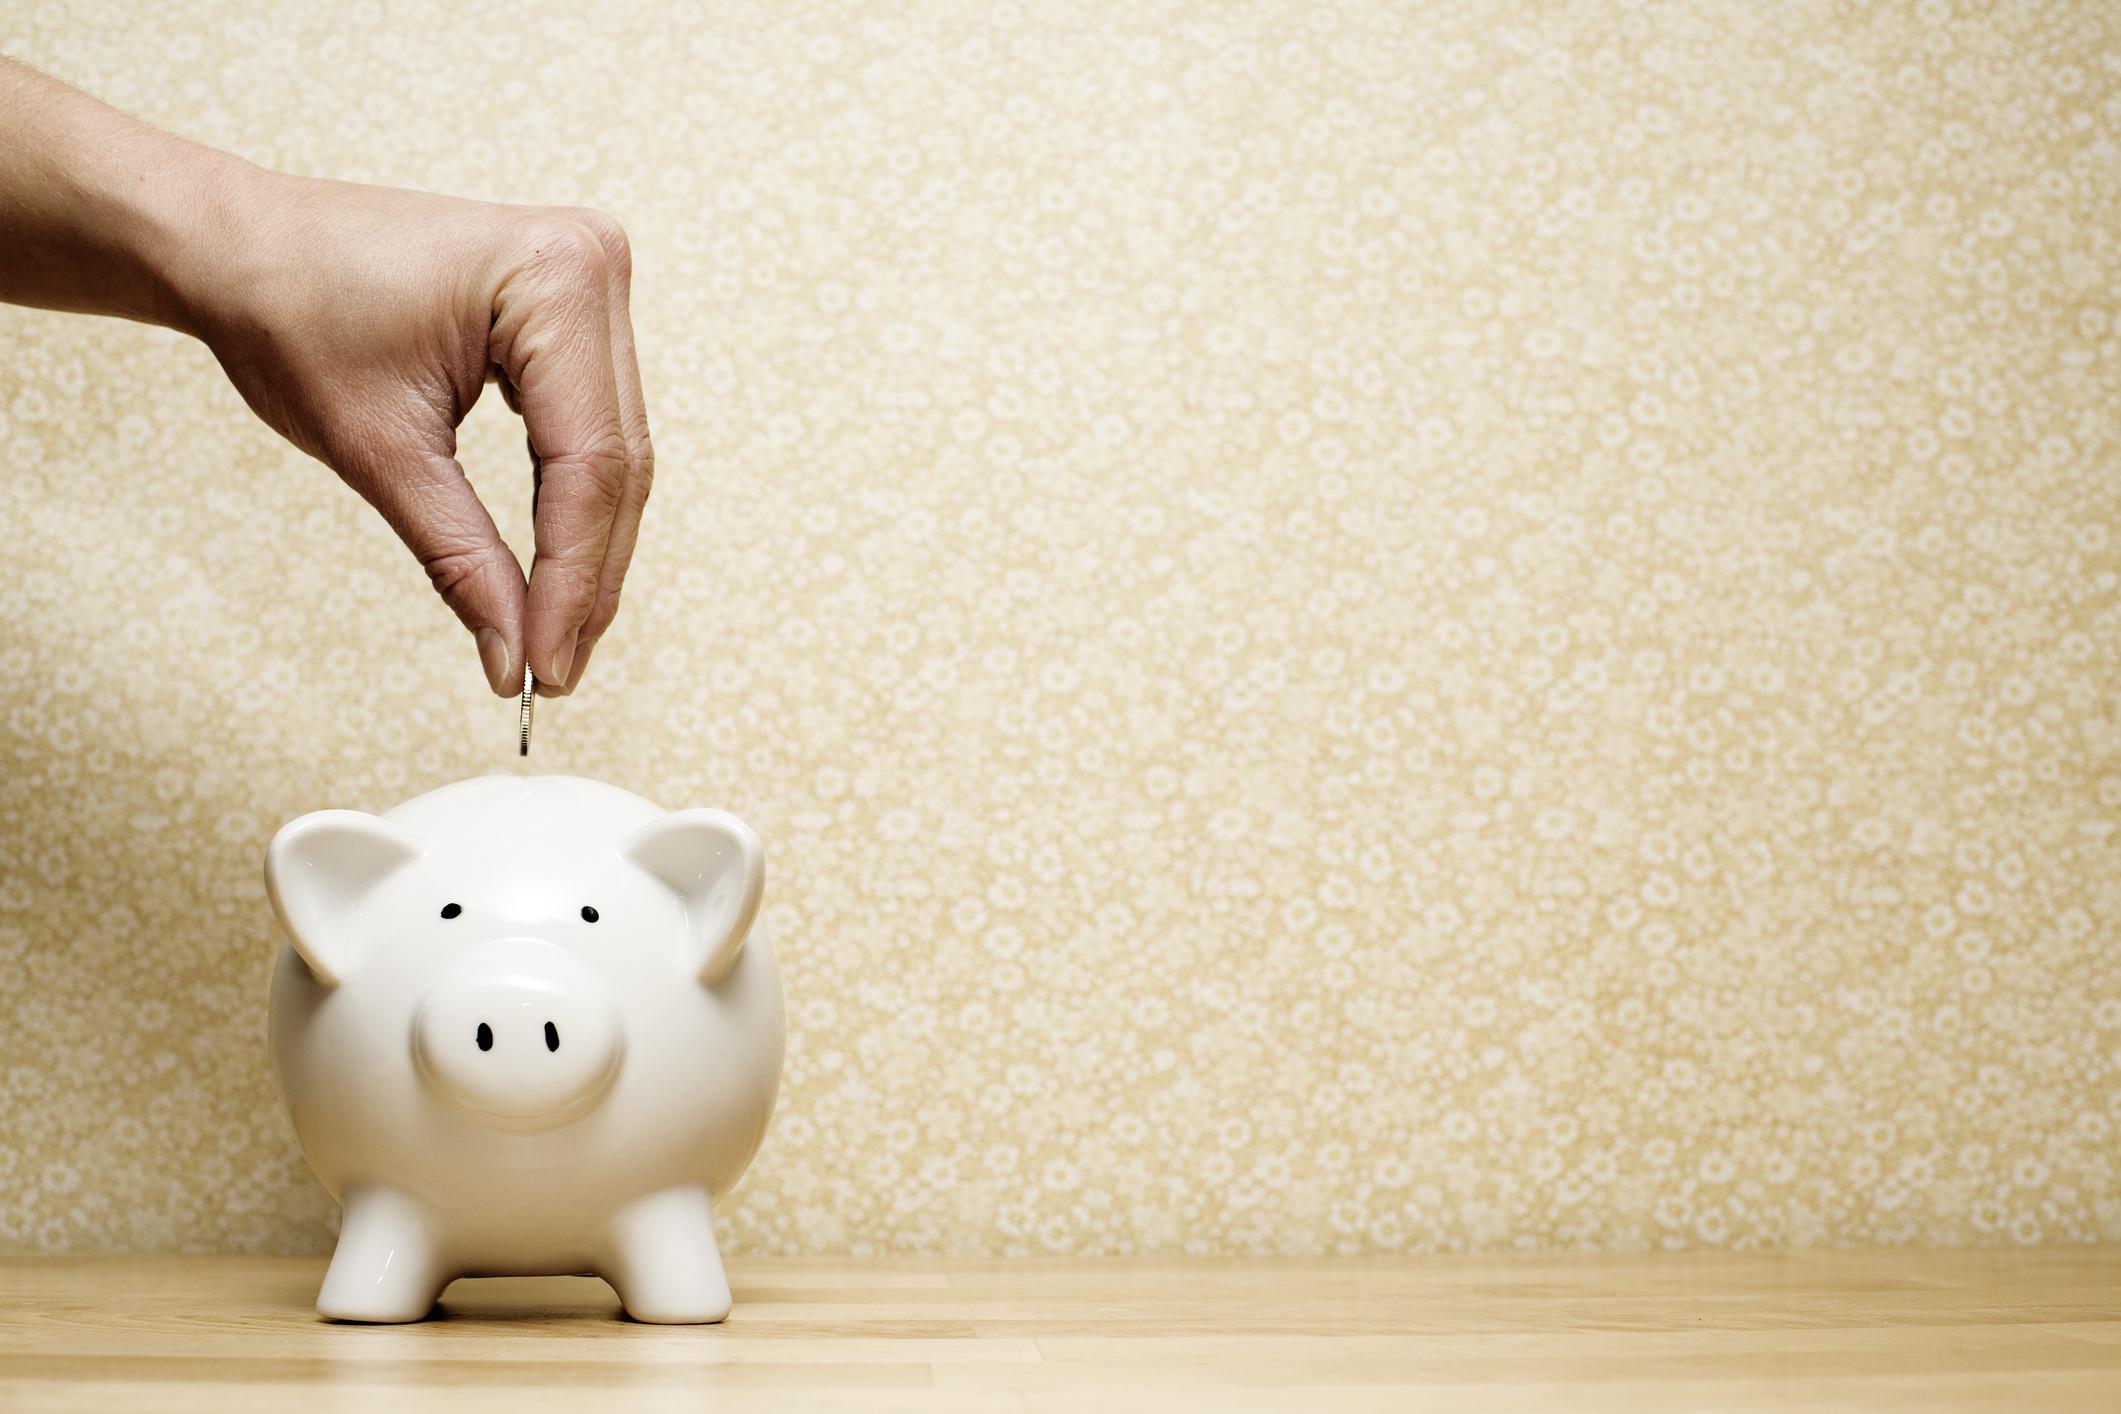 Person putting coin into a white piggy bank